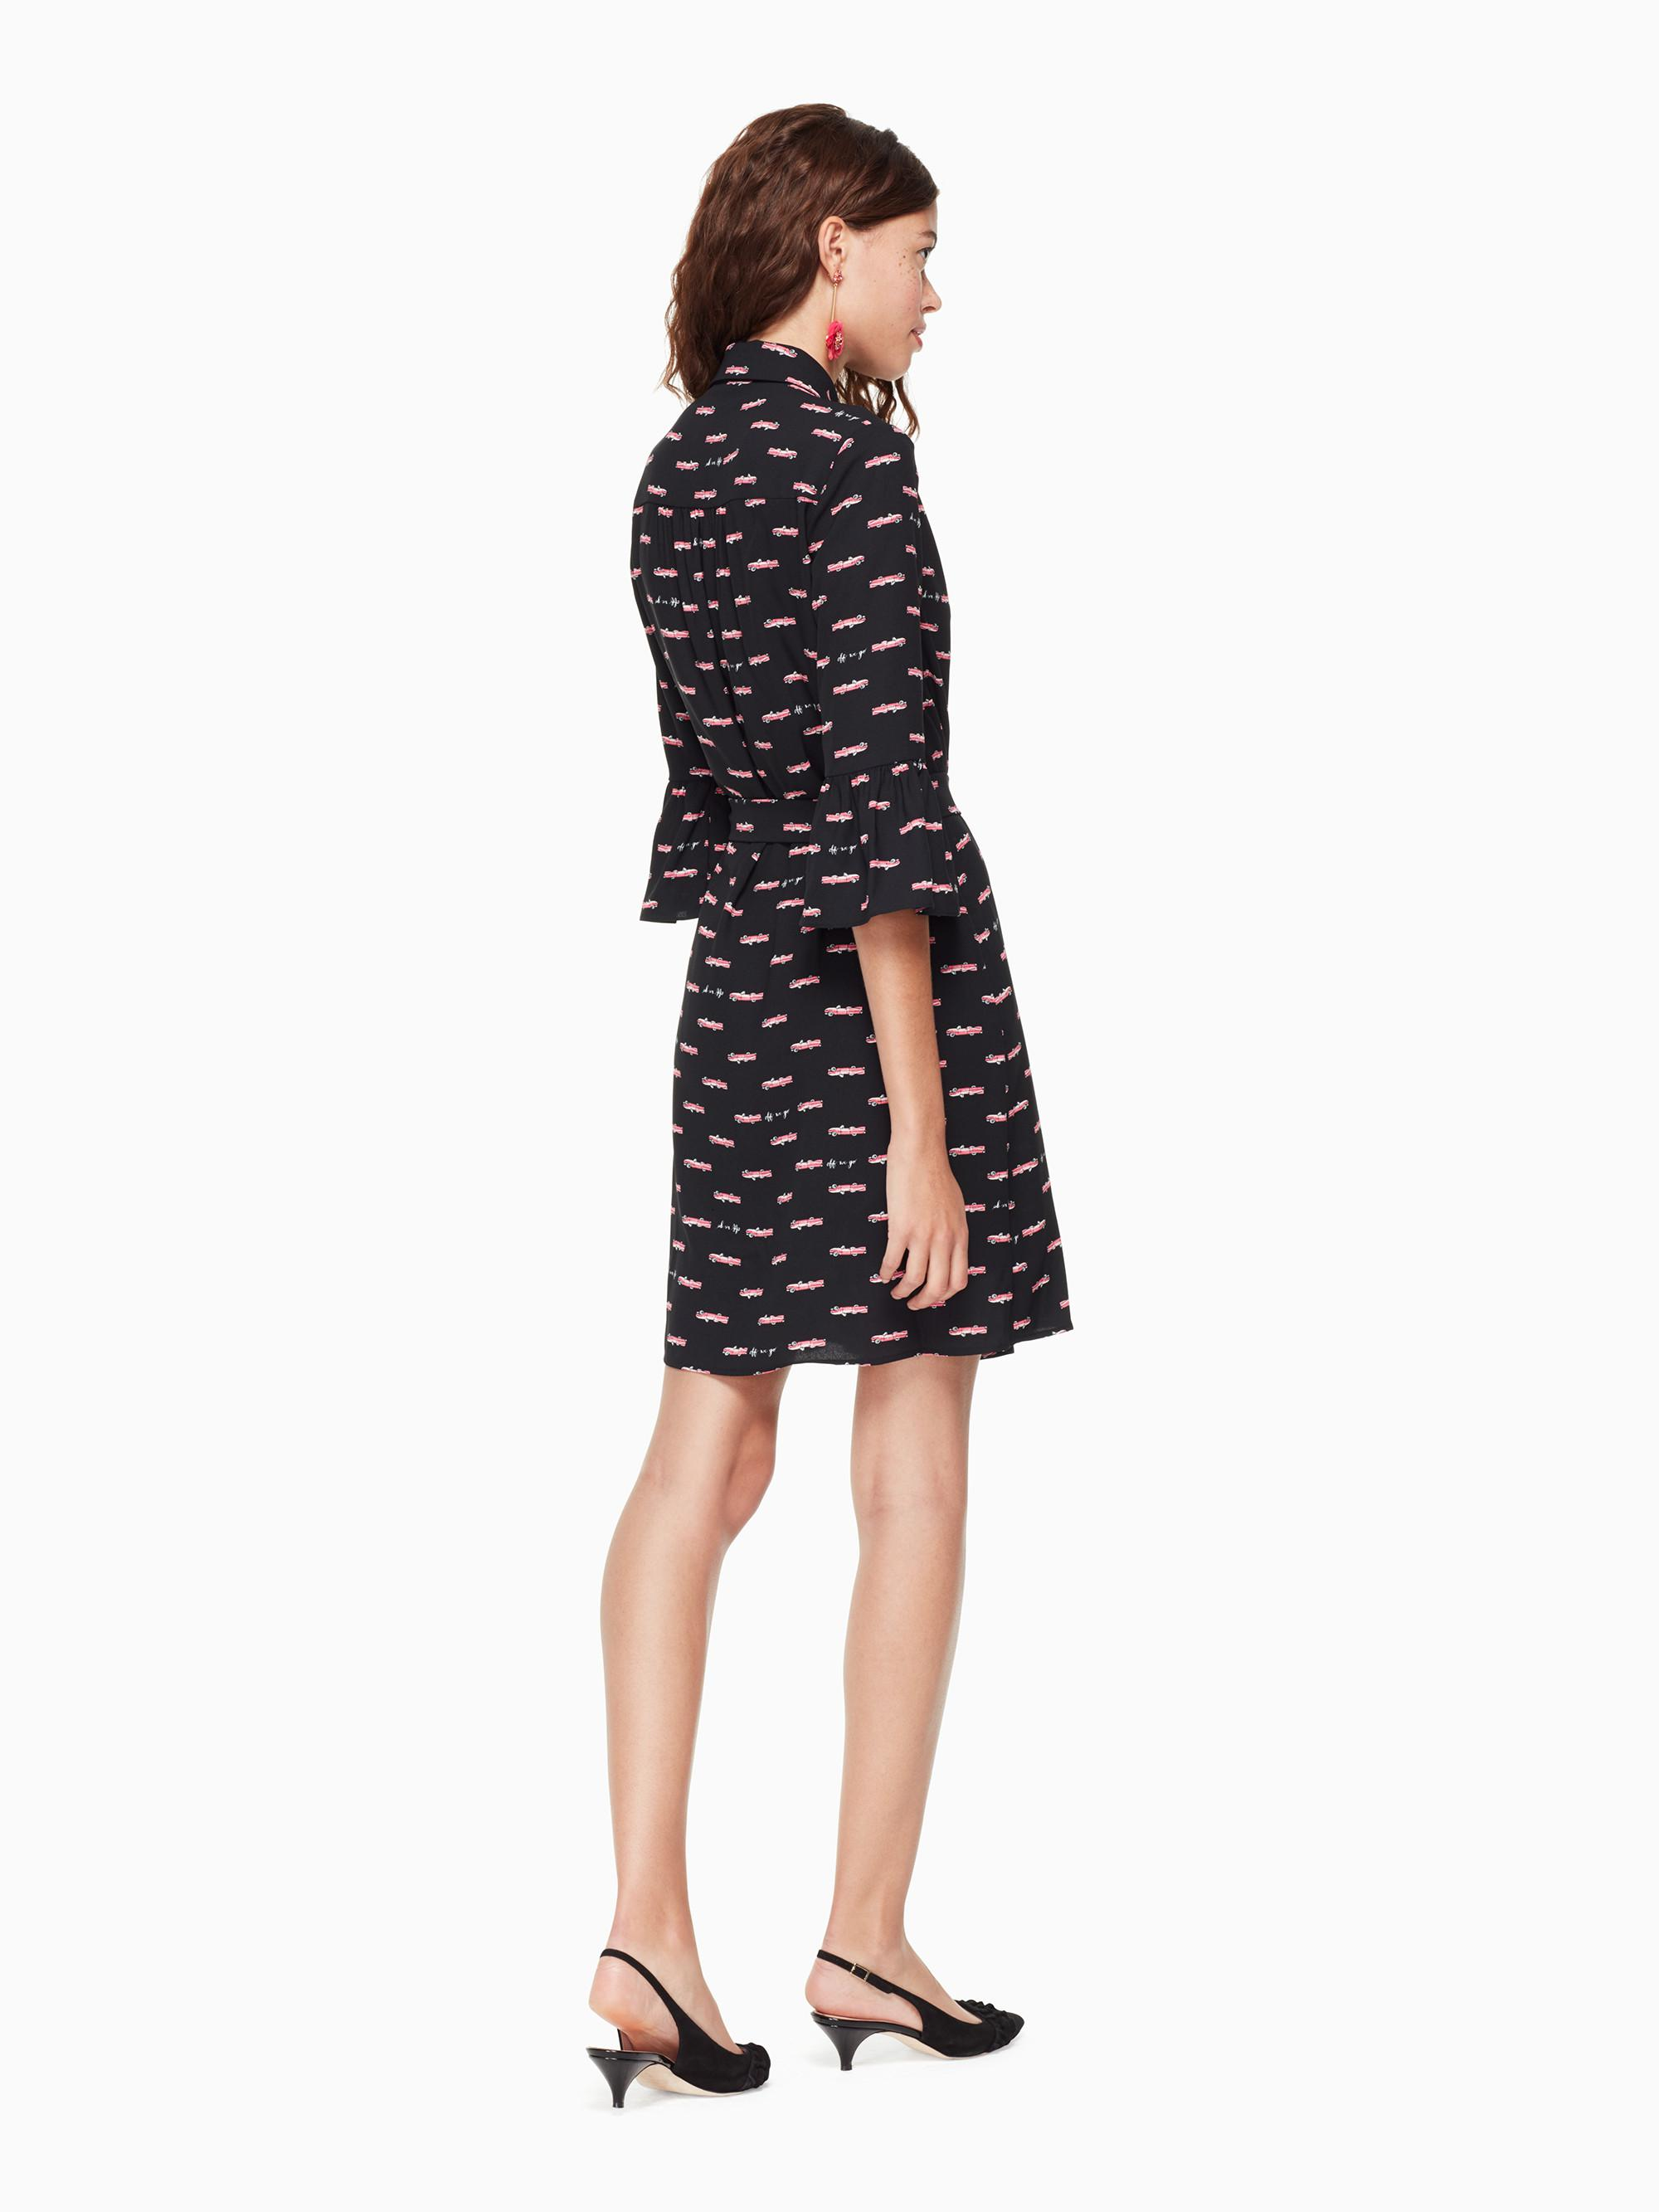 Lyst - Kate Spade Hot Rod Shirtdress in Black